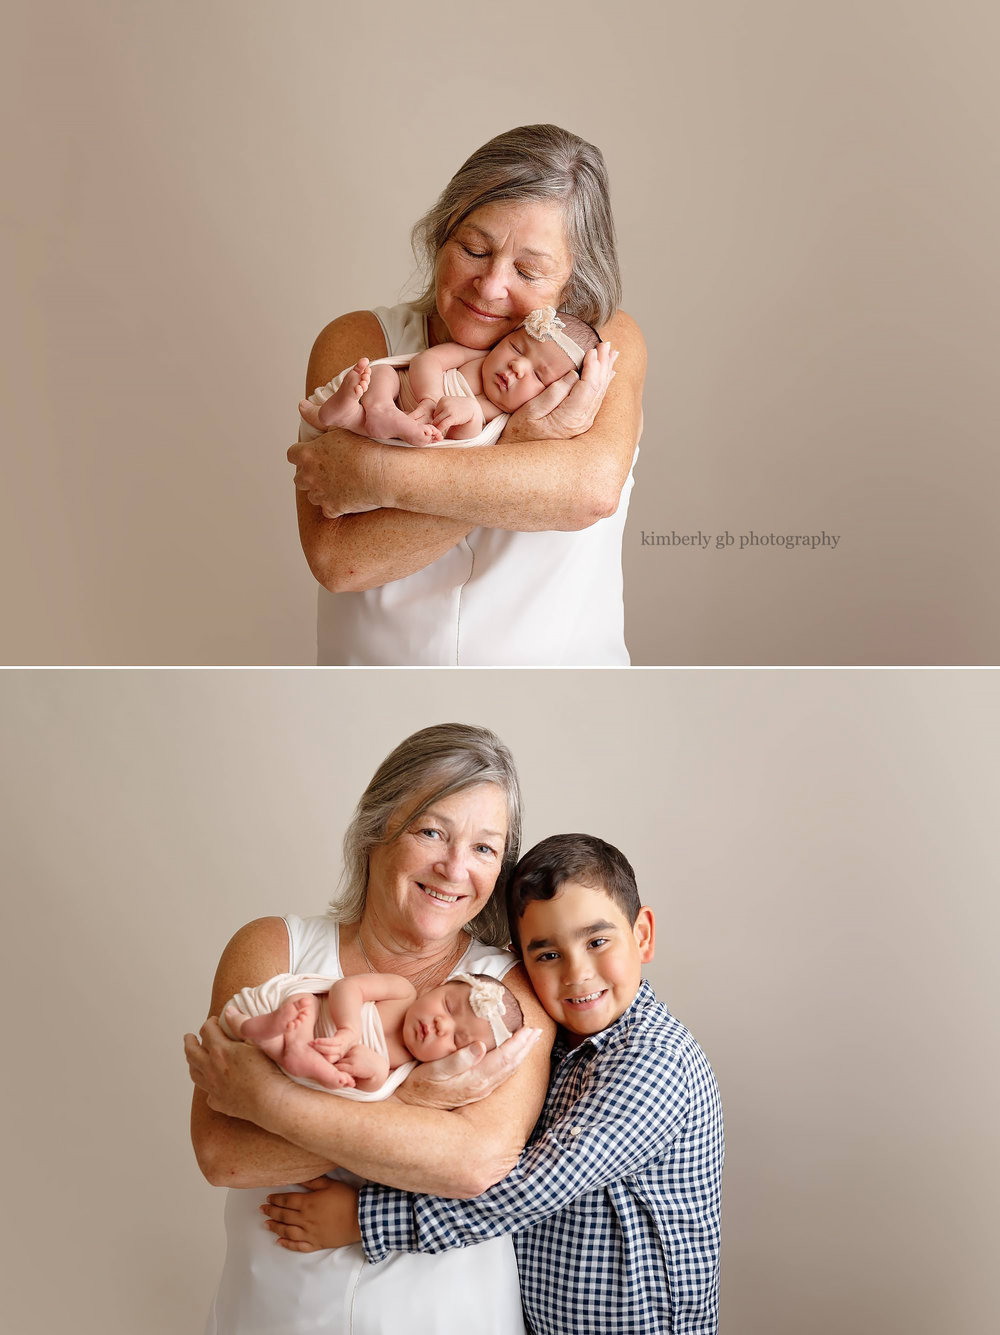 fotografia-de-recien-nacidos-bebes-newborn-en-puerto-rico-kimberly-gb-photography-fotografa-7.jpg